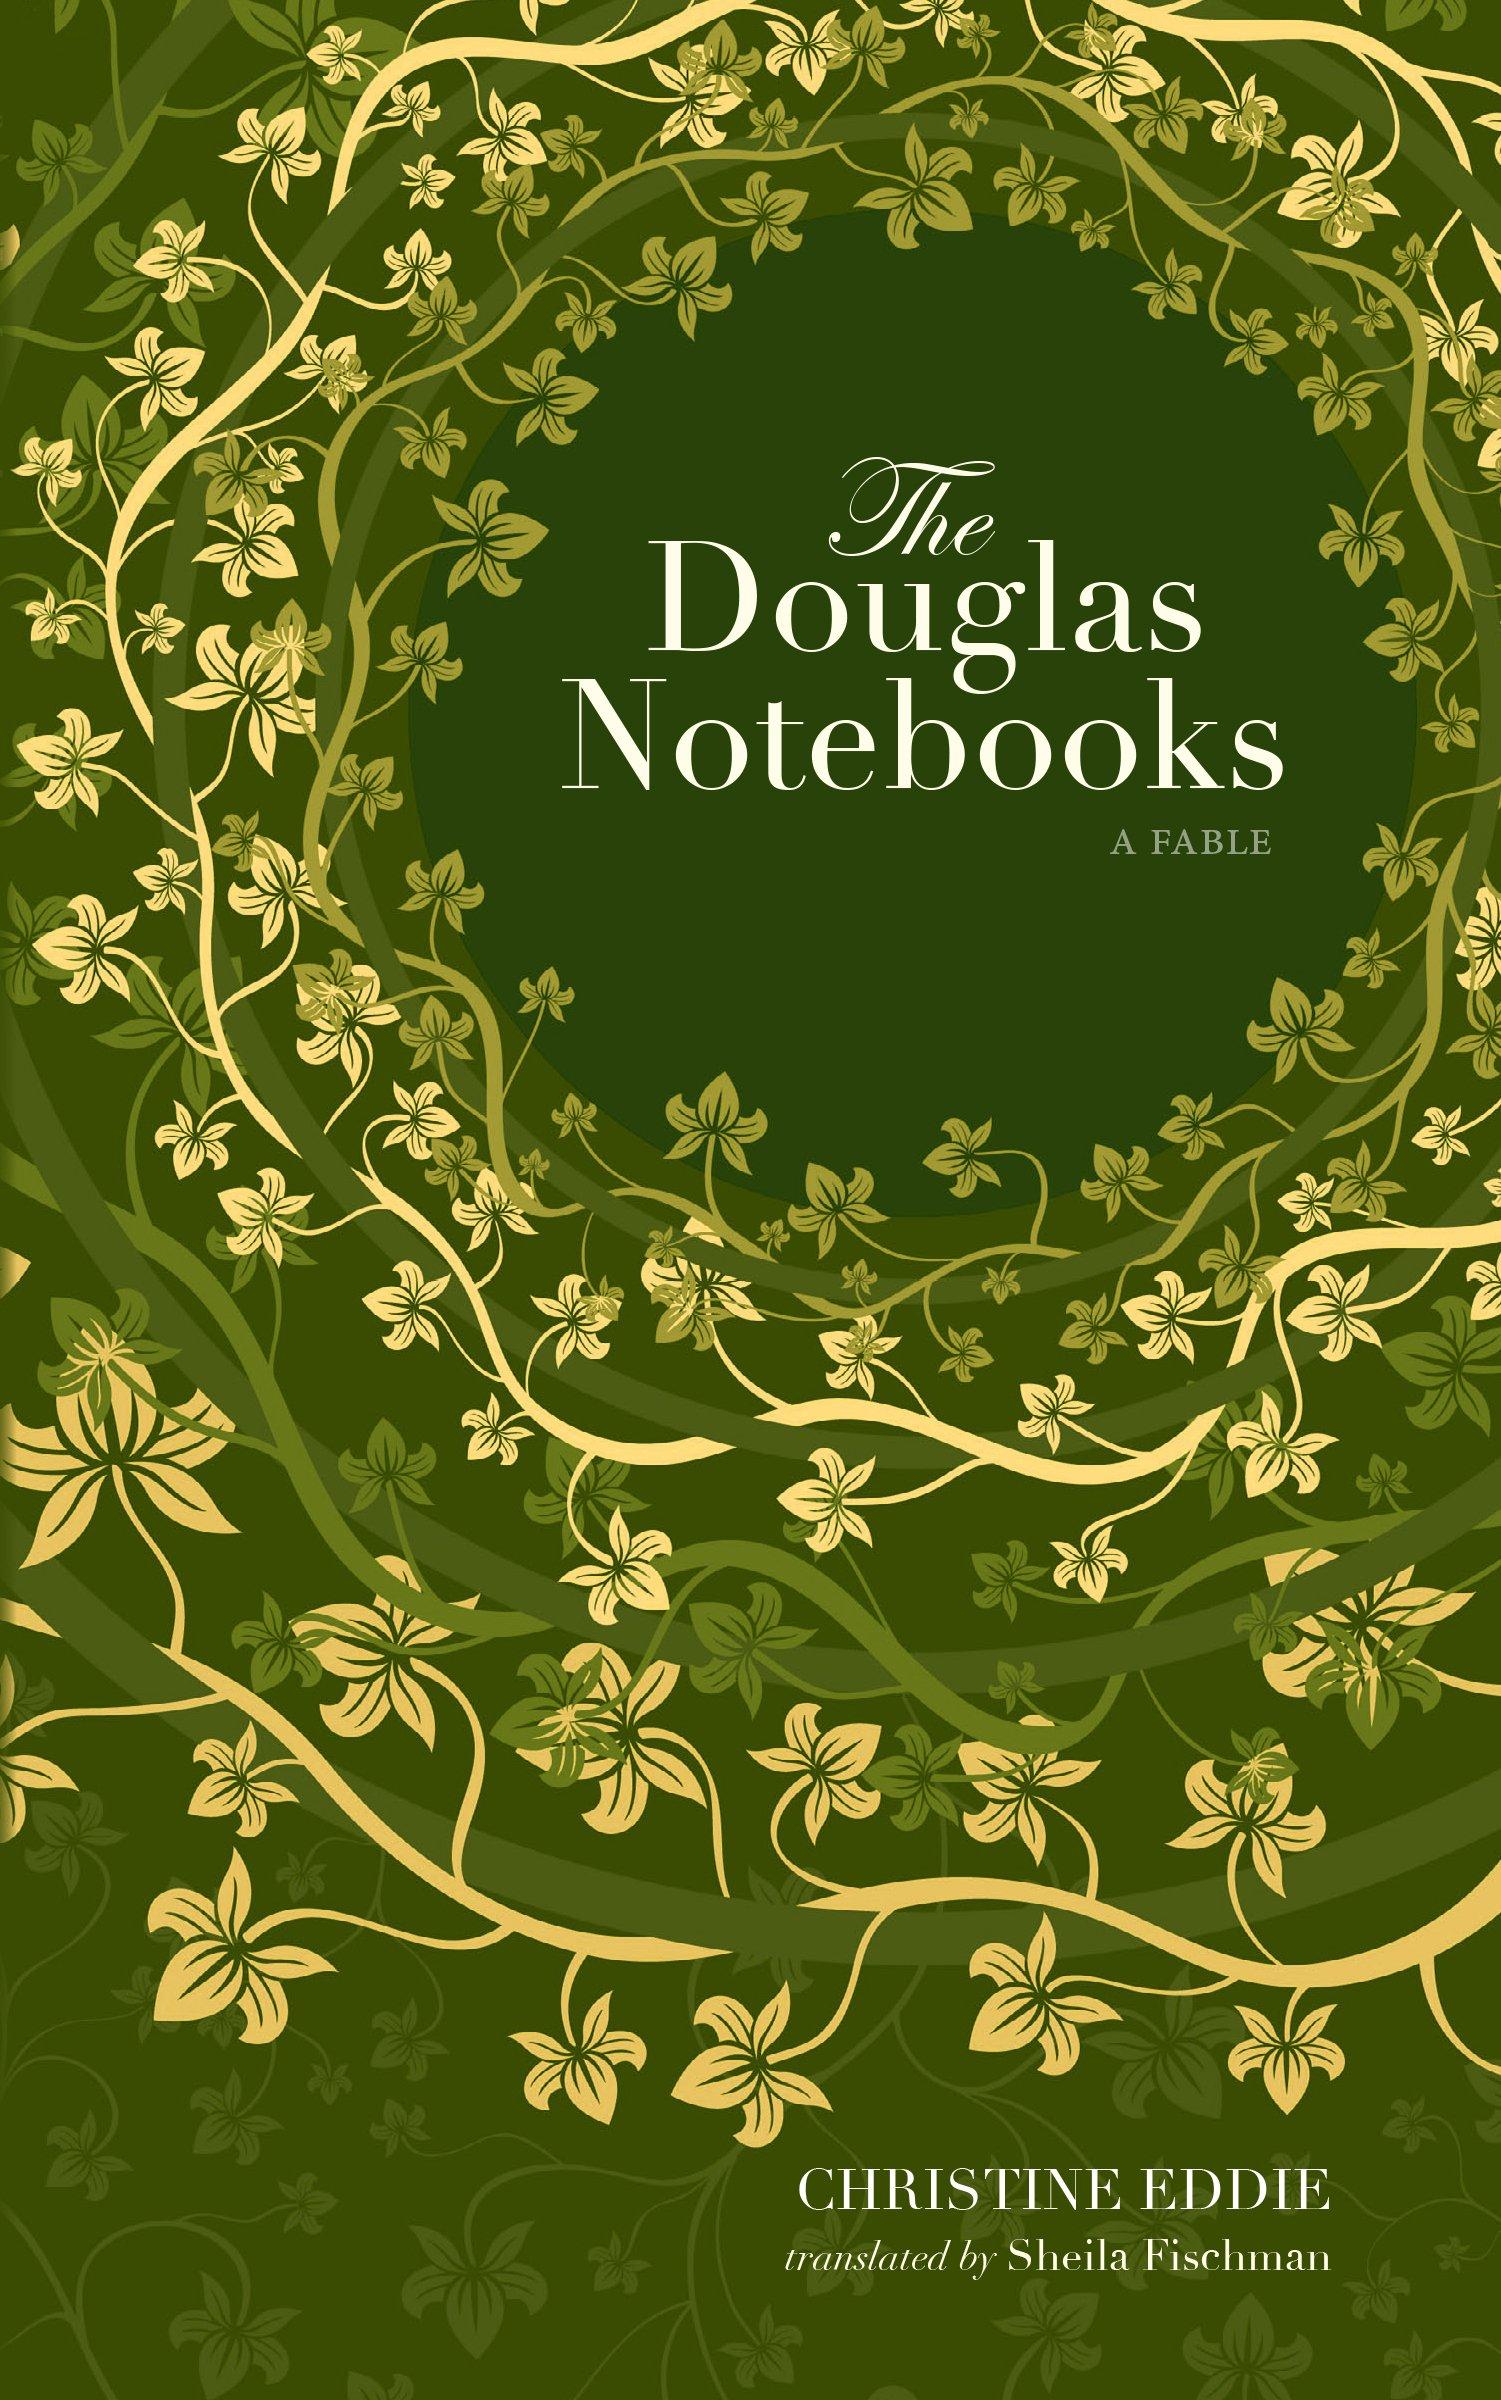 Amazon com: The Douglas Notebooks: A Fable (9780864926197